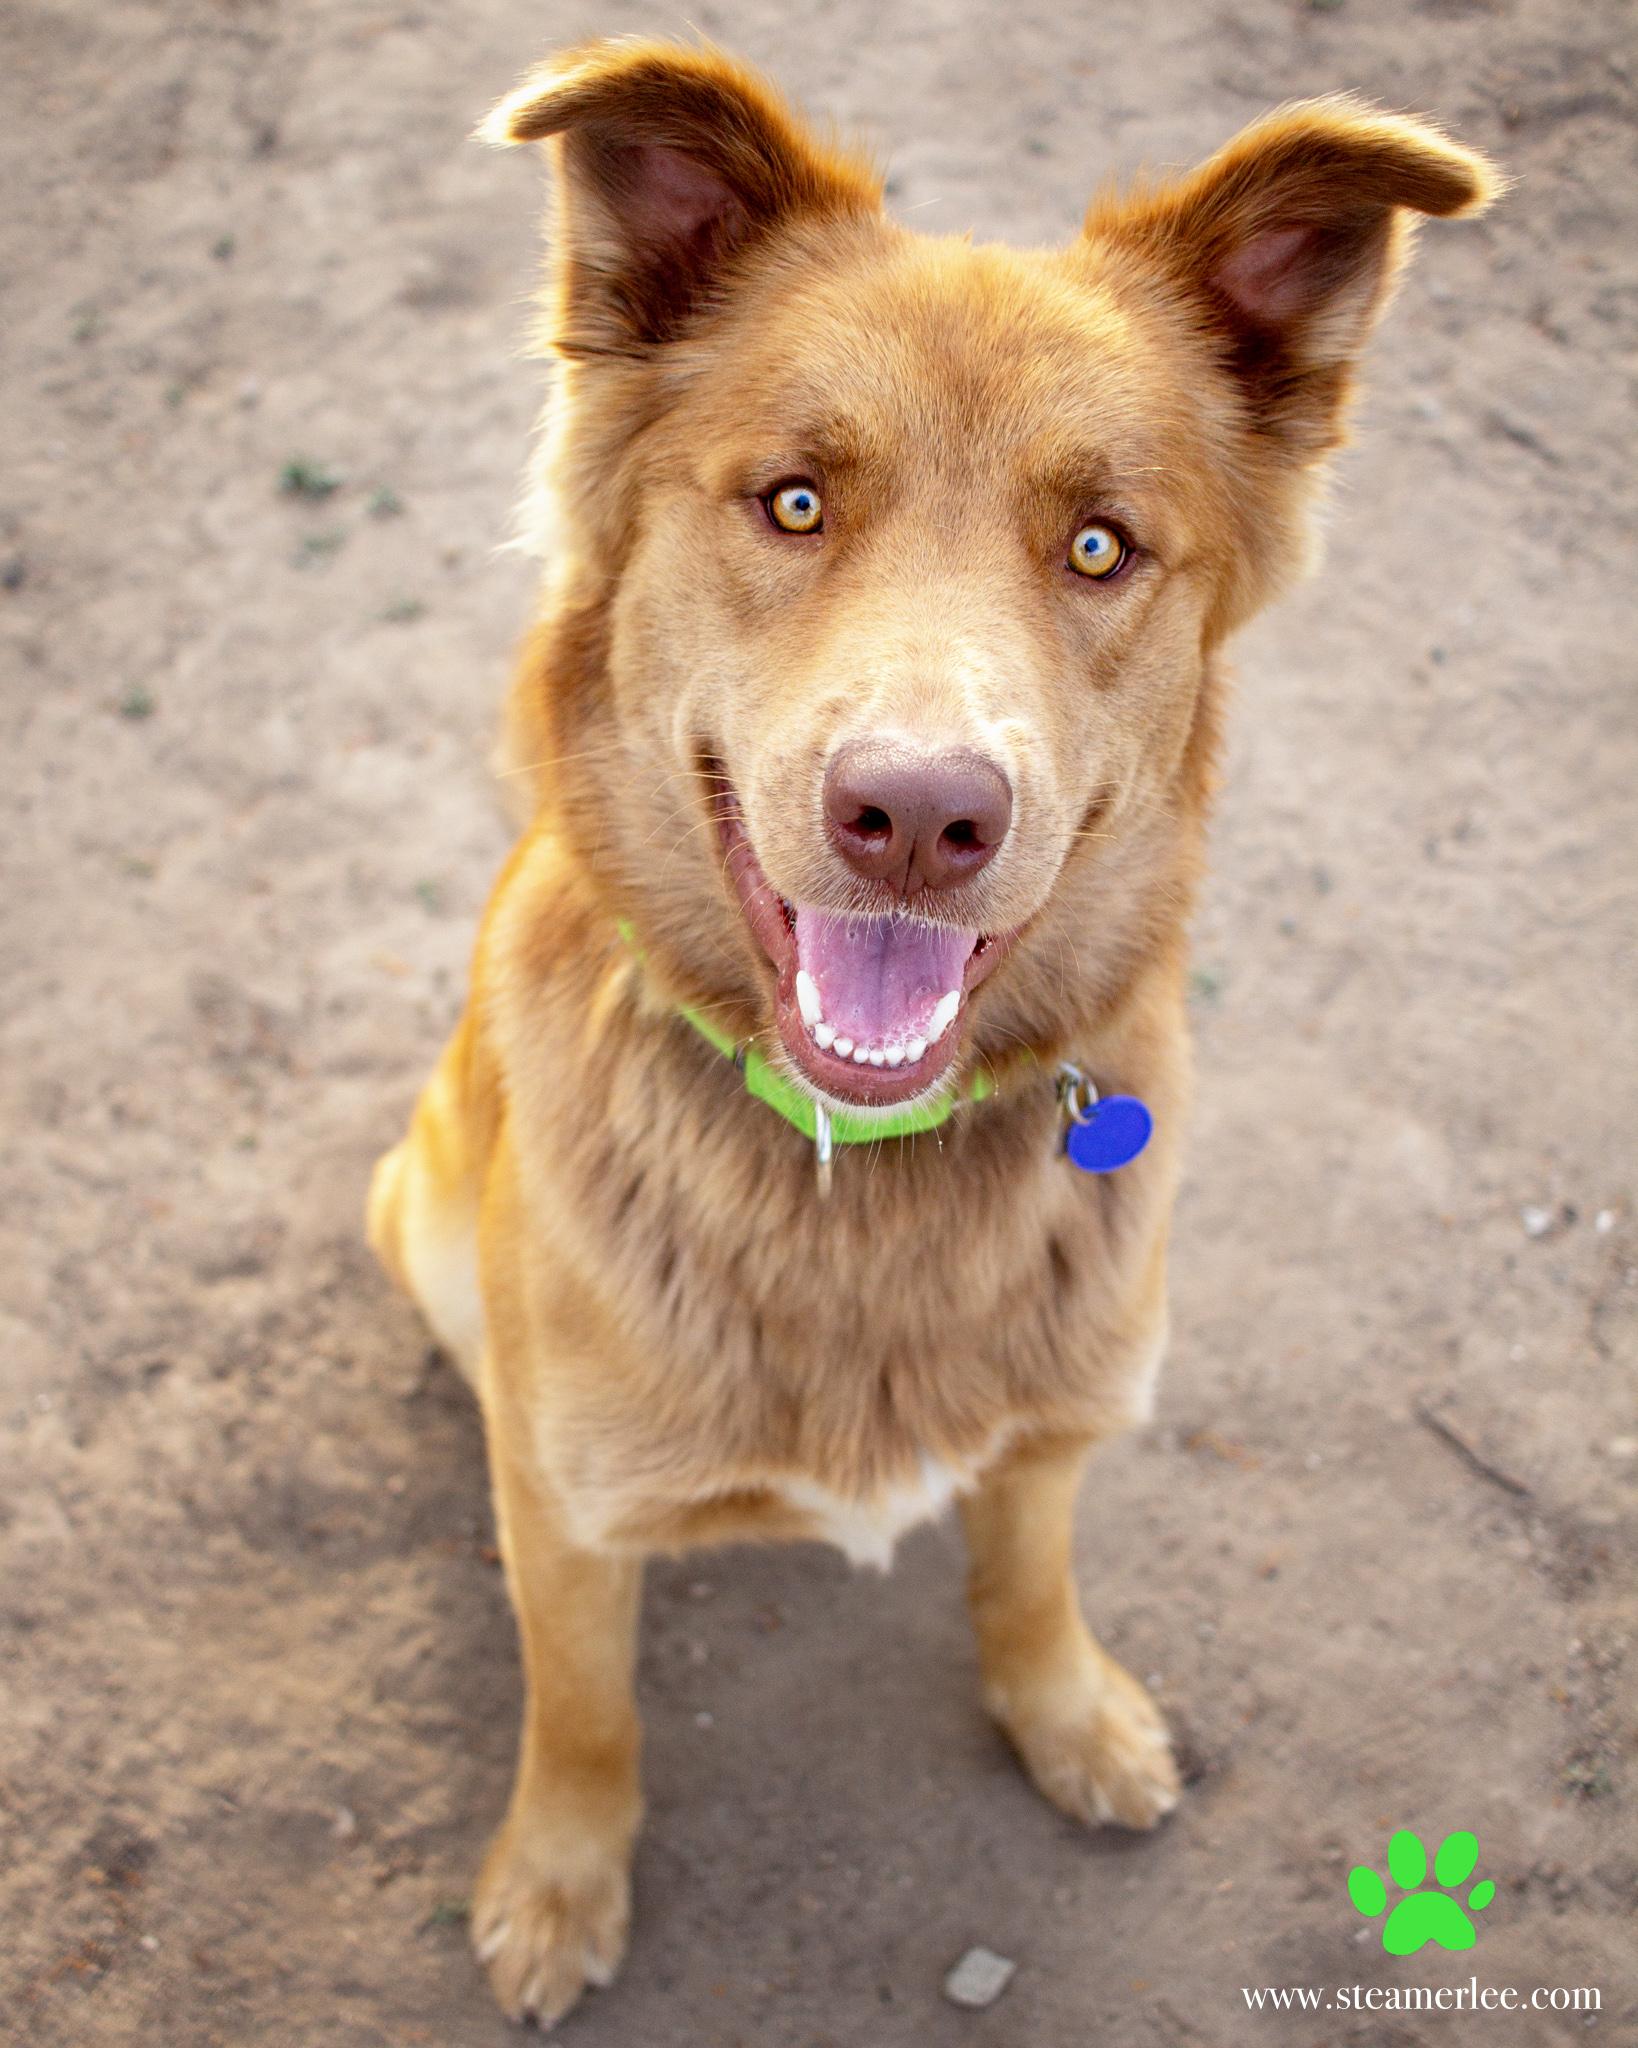 316-Orange-County-Dog-Photography-Steamer-Lee-Southern-California-SBACC.JPG